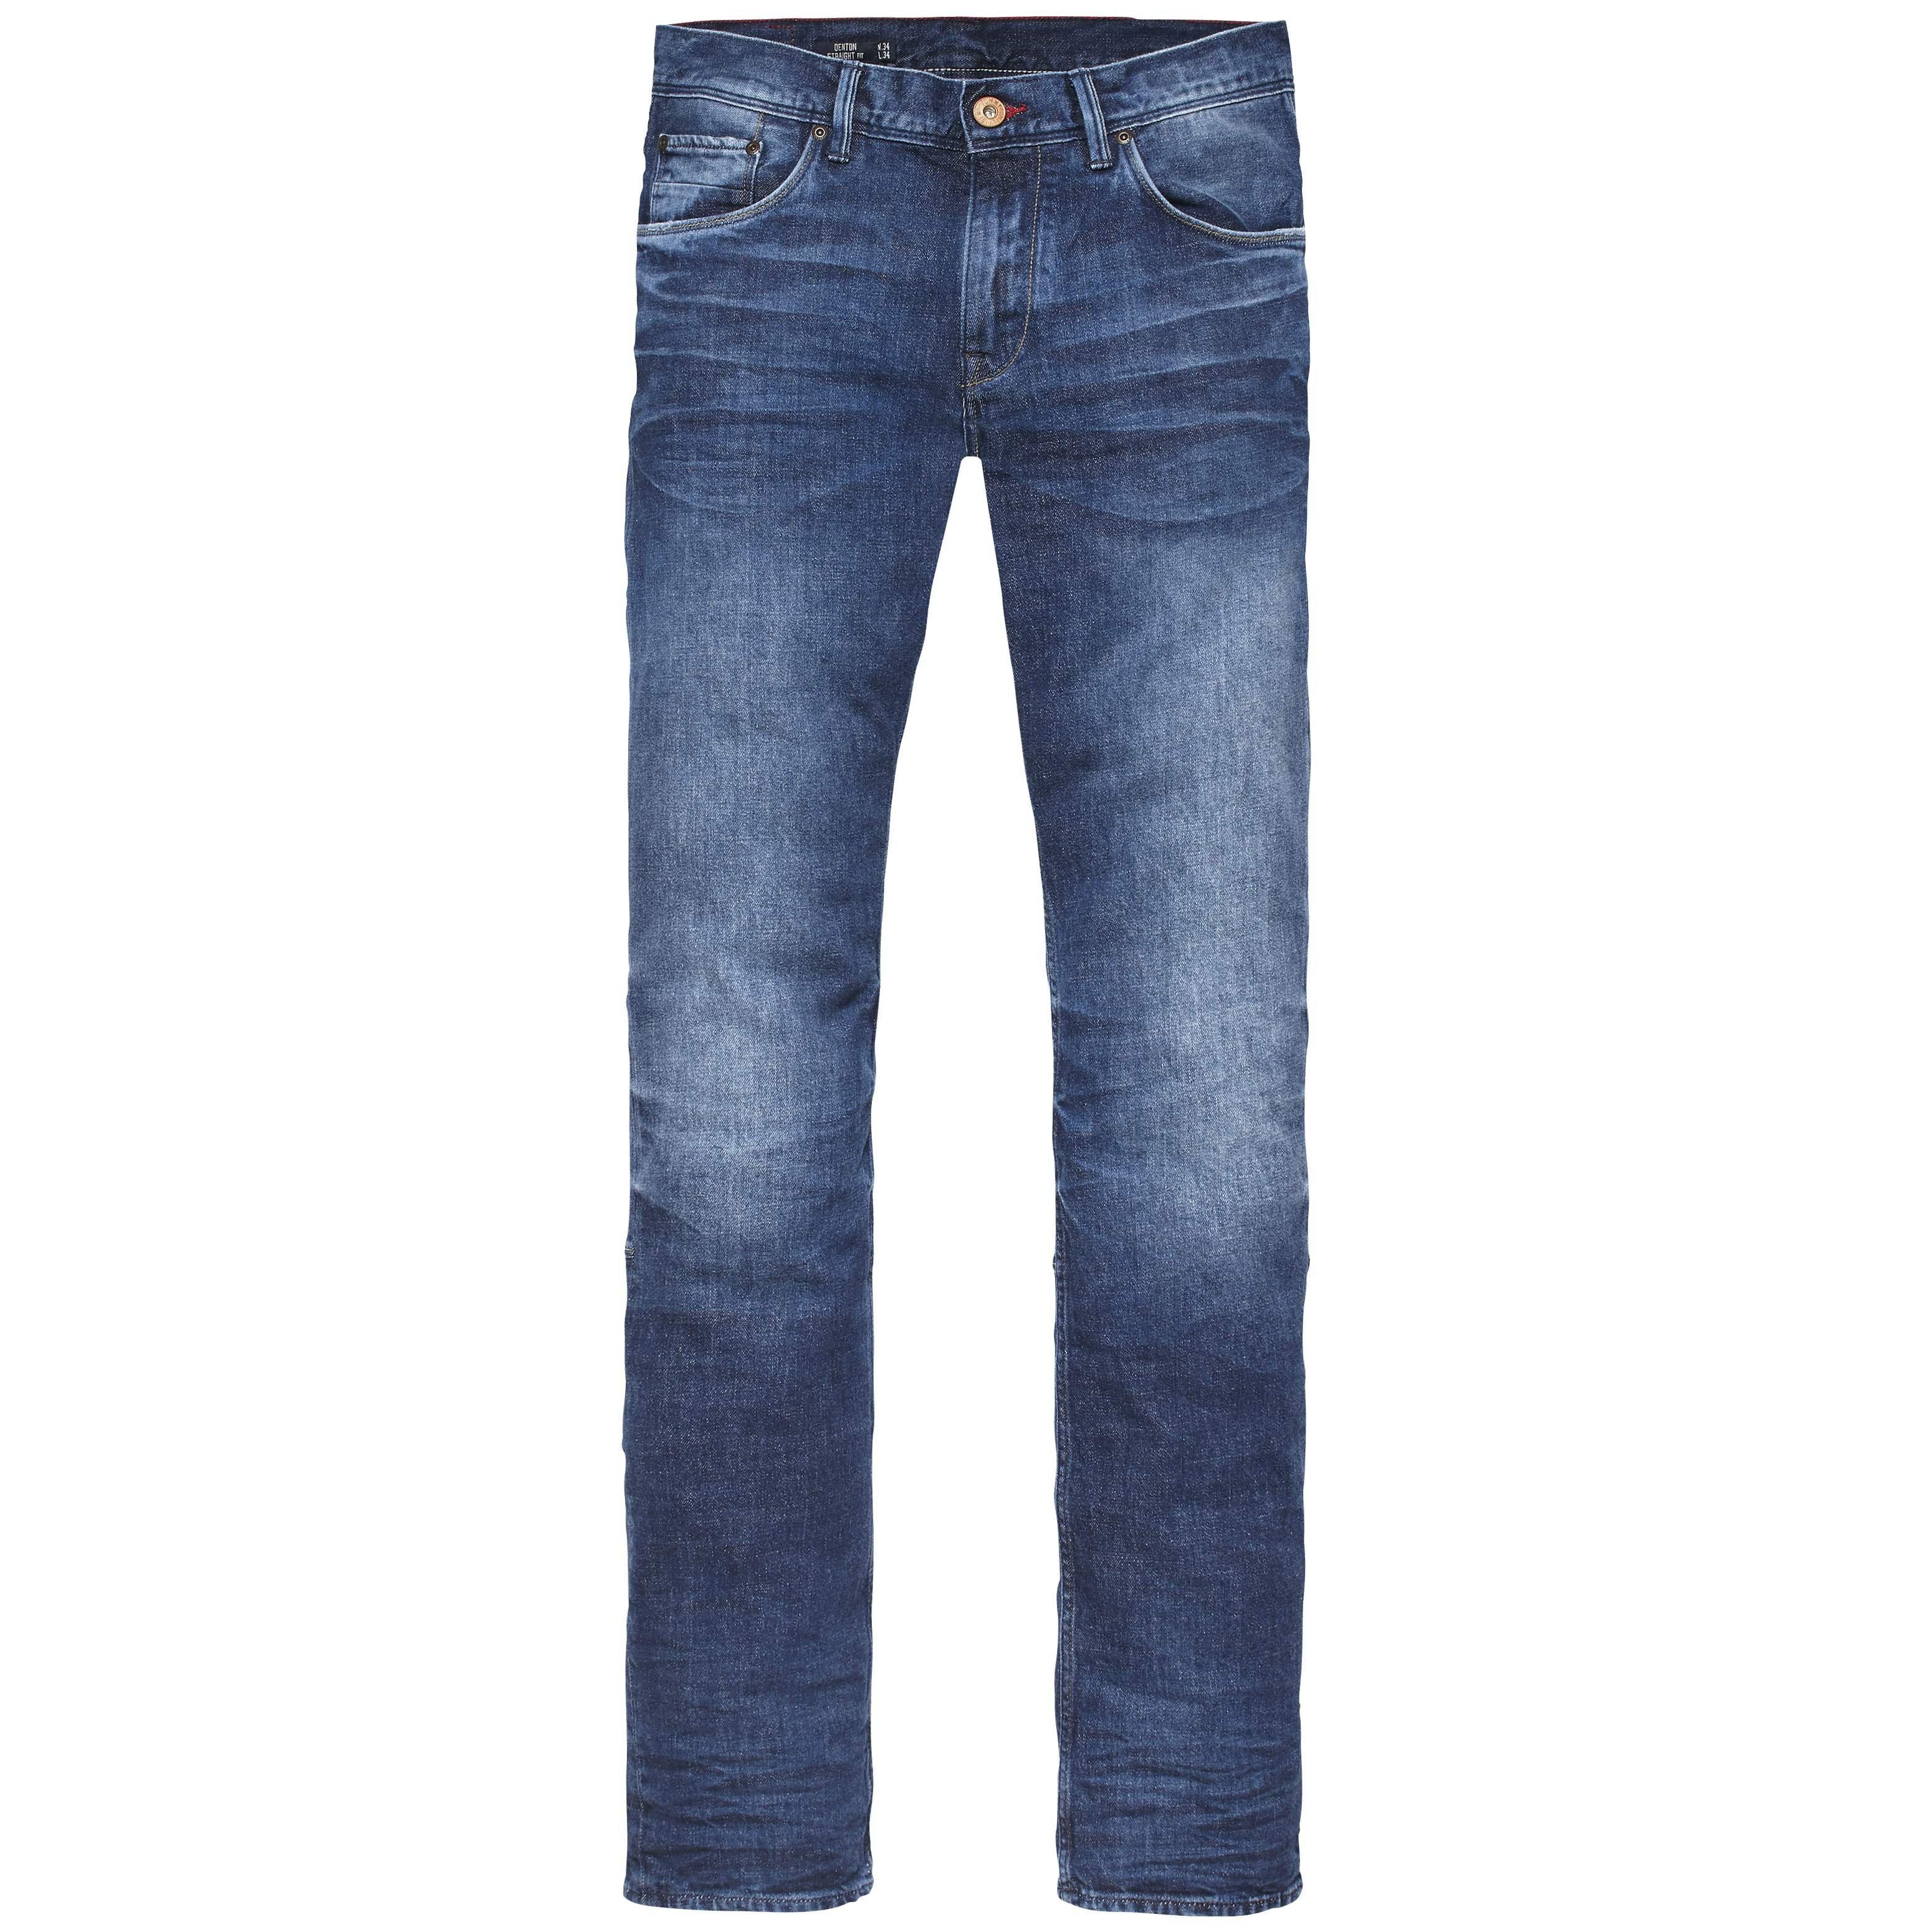 Herrenmode Jeans